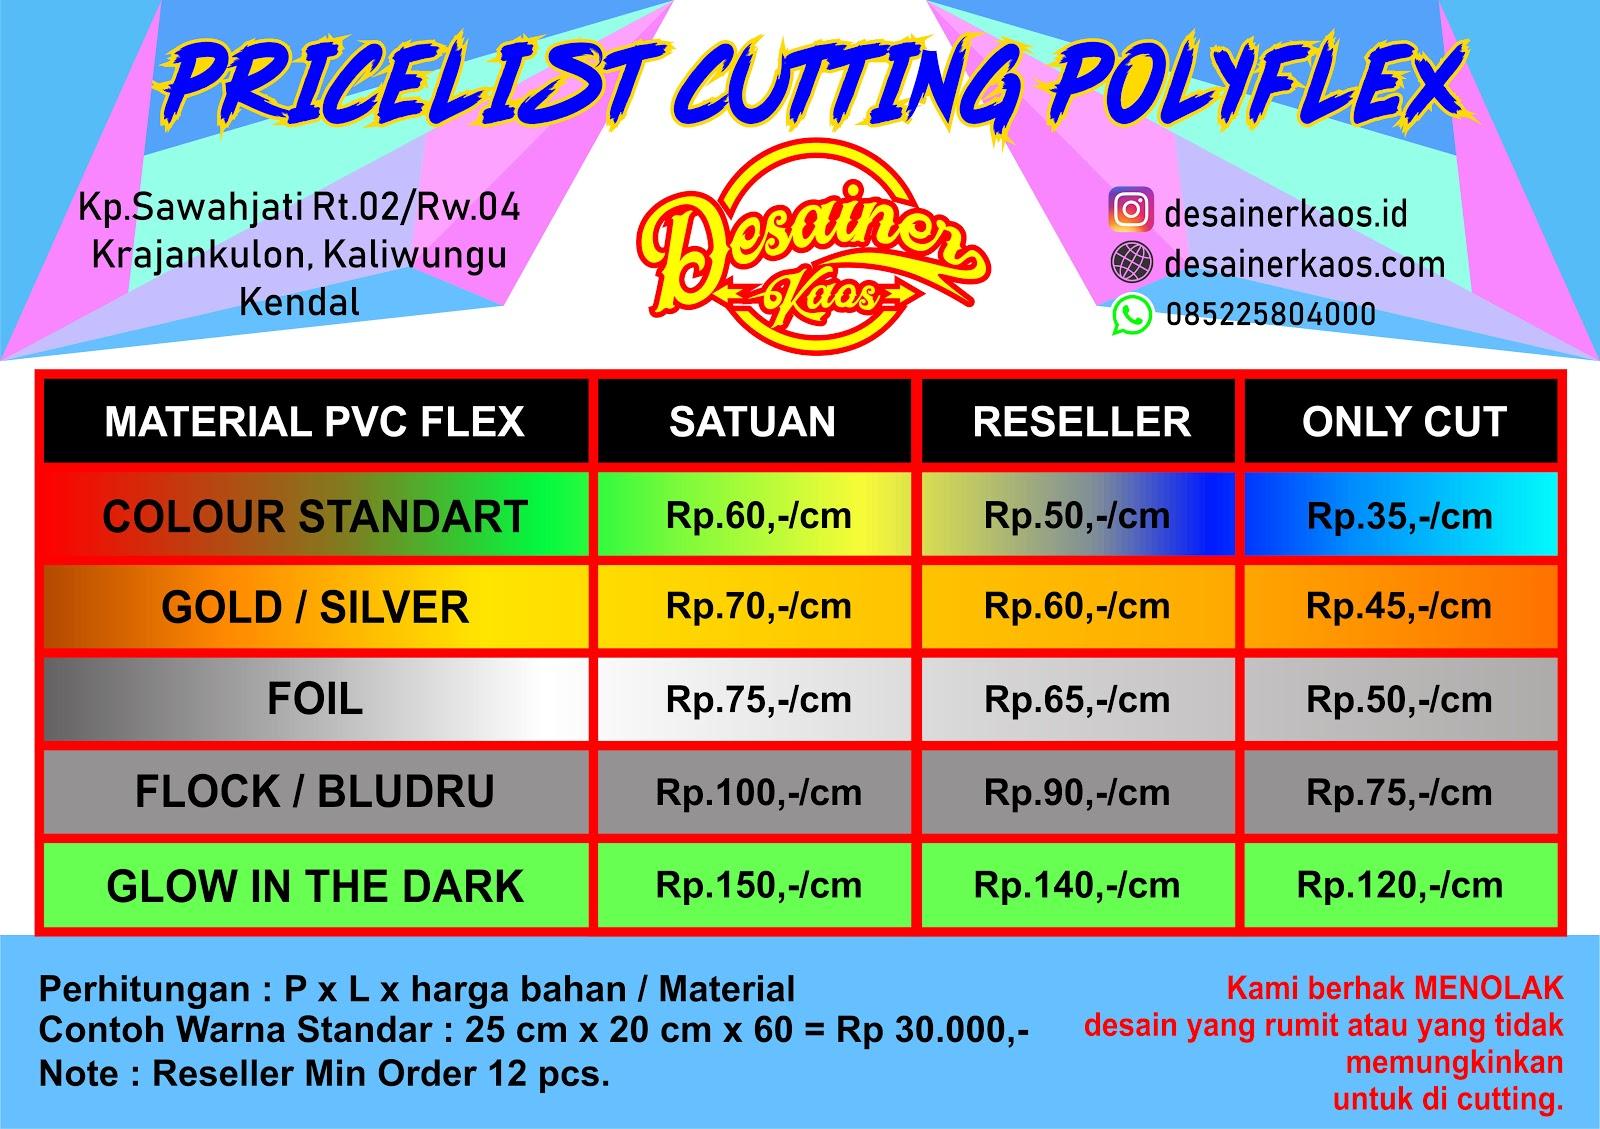 harga polyflex